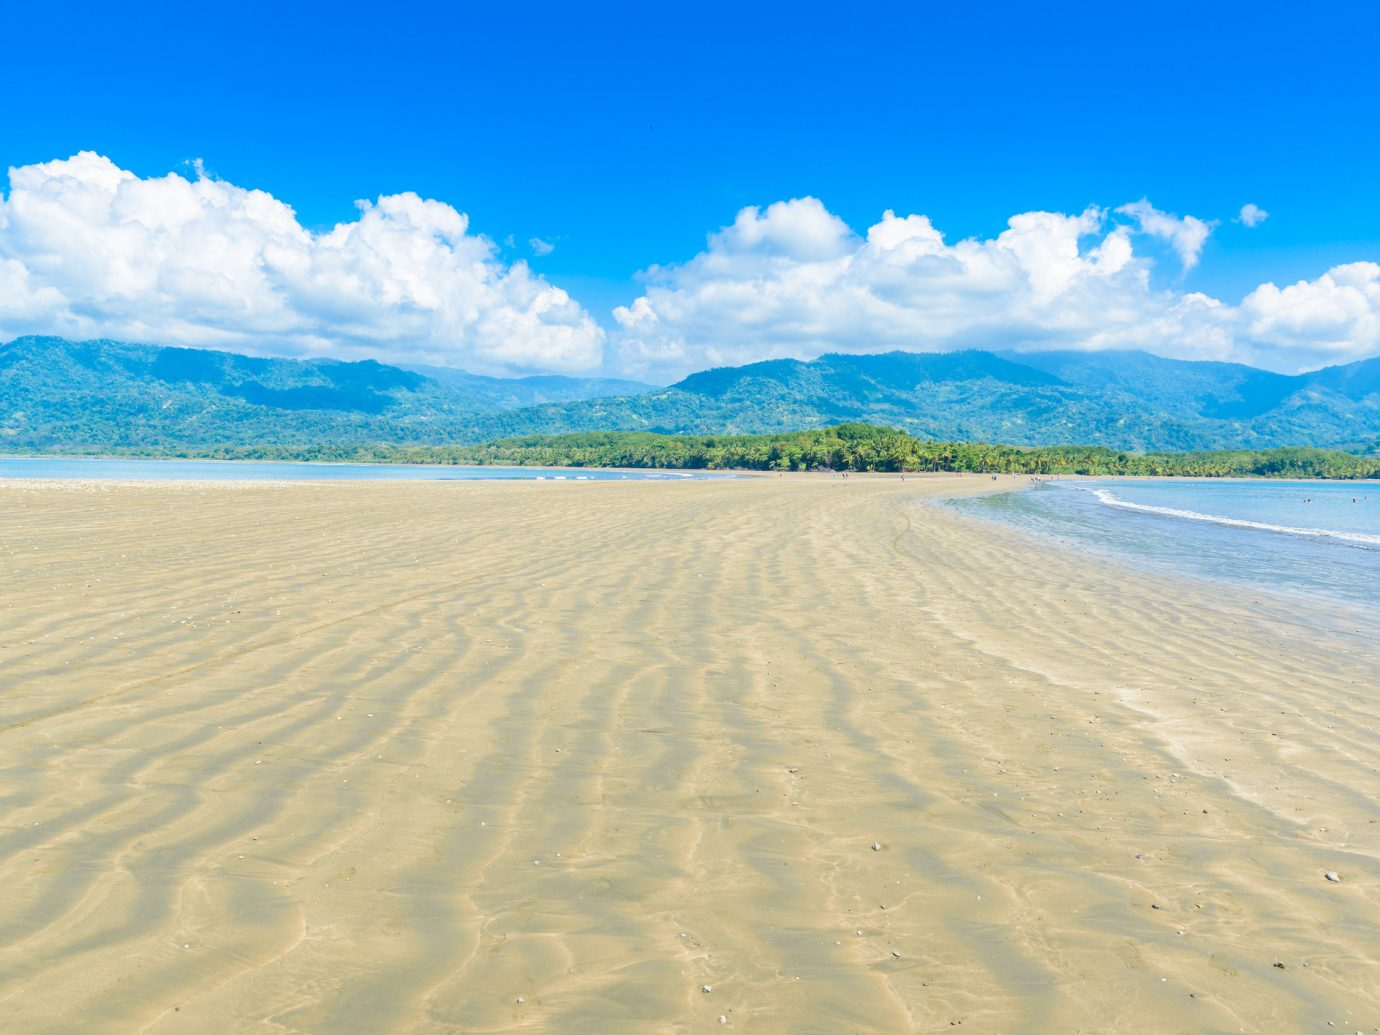 Playa Hermosa beach in Costa Rica